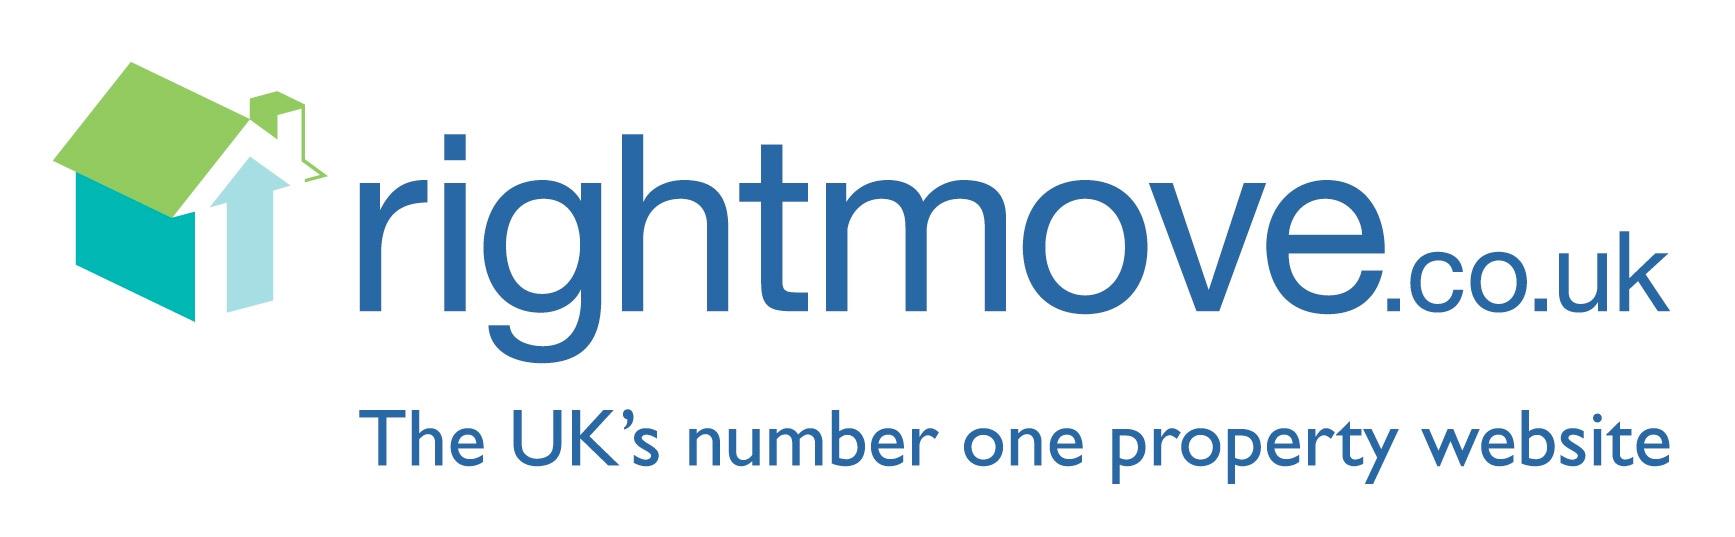 rightmove-logo.jpg